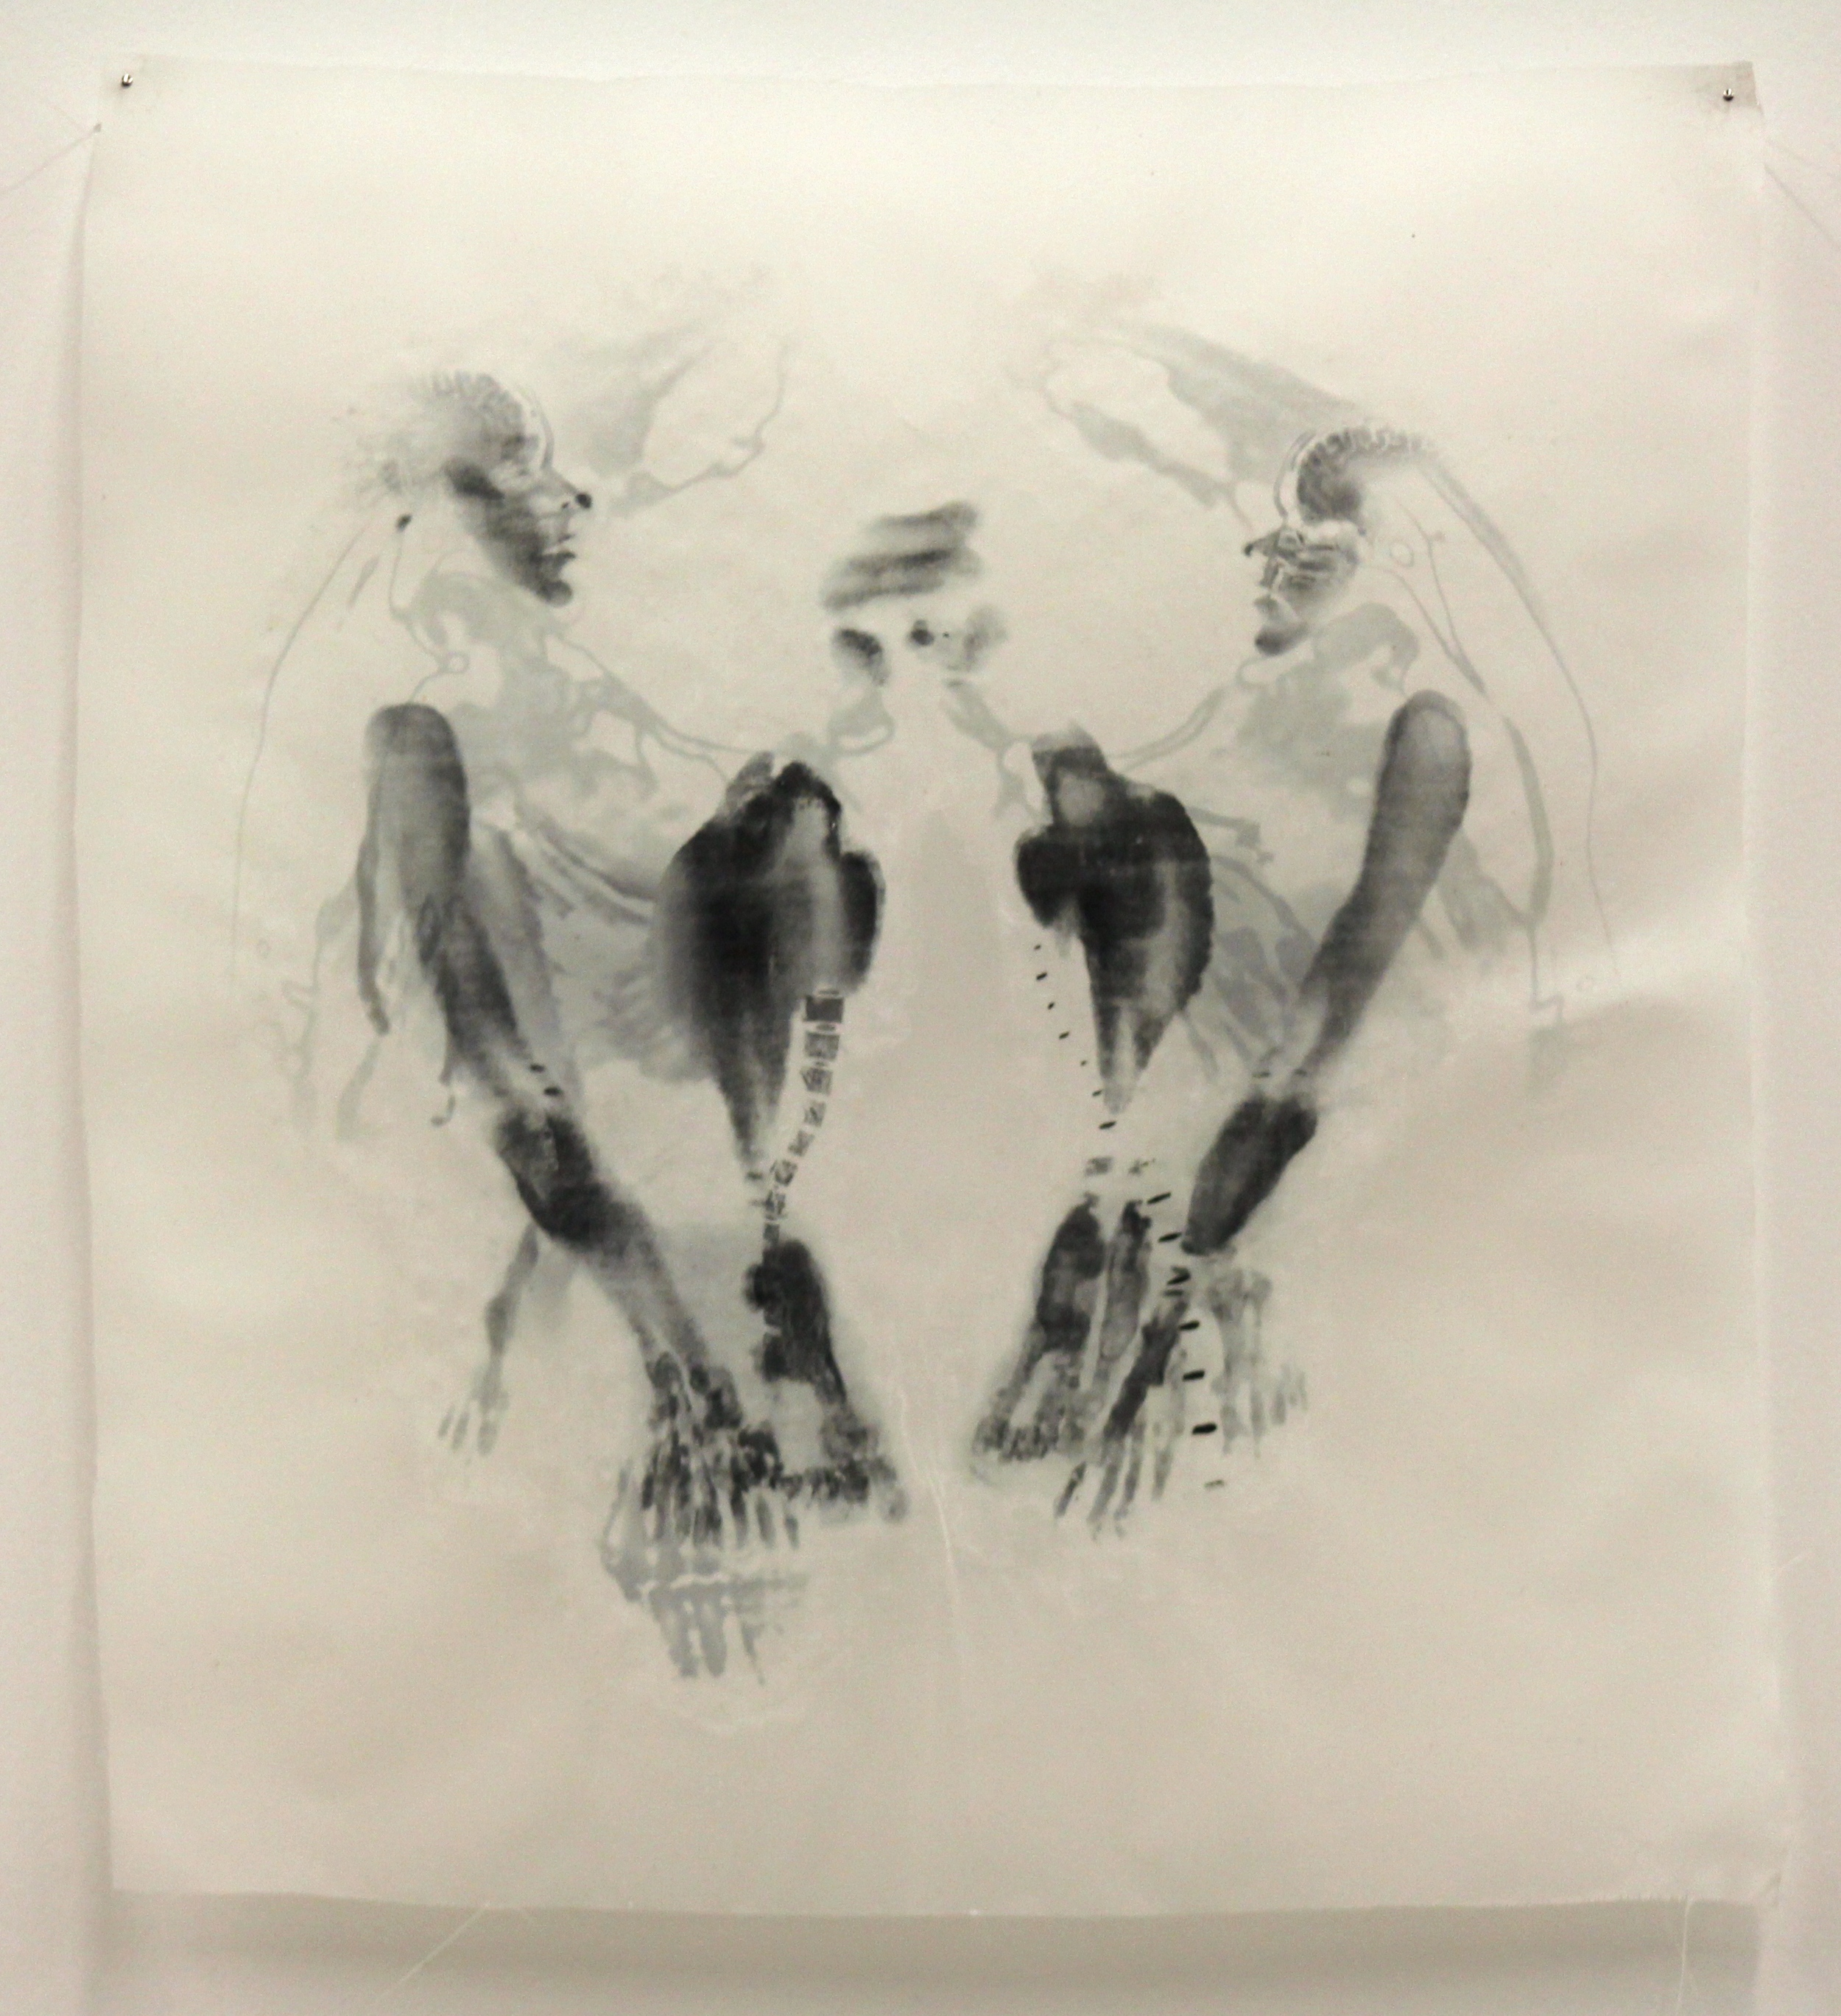 """Dualism VI,"" Toner transfer on waxed silk, 11"" x 10,"" 2015"